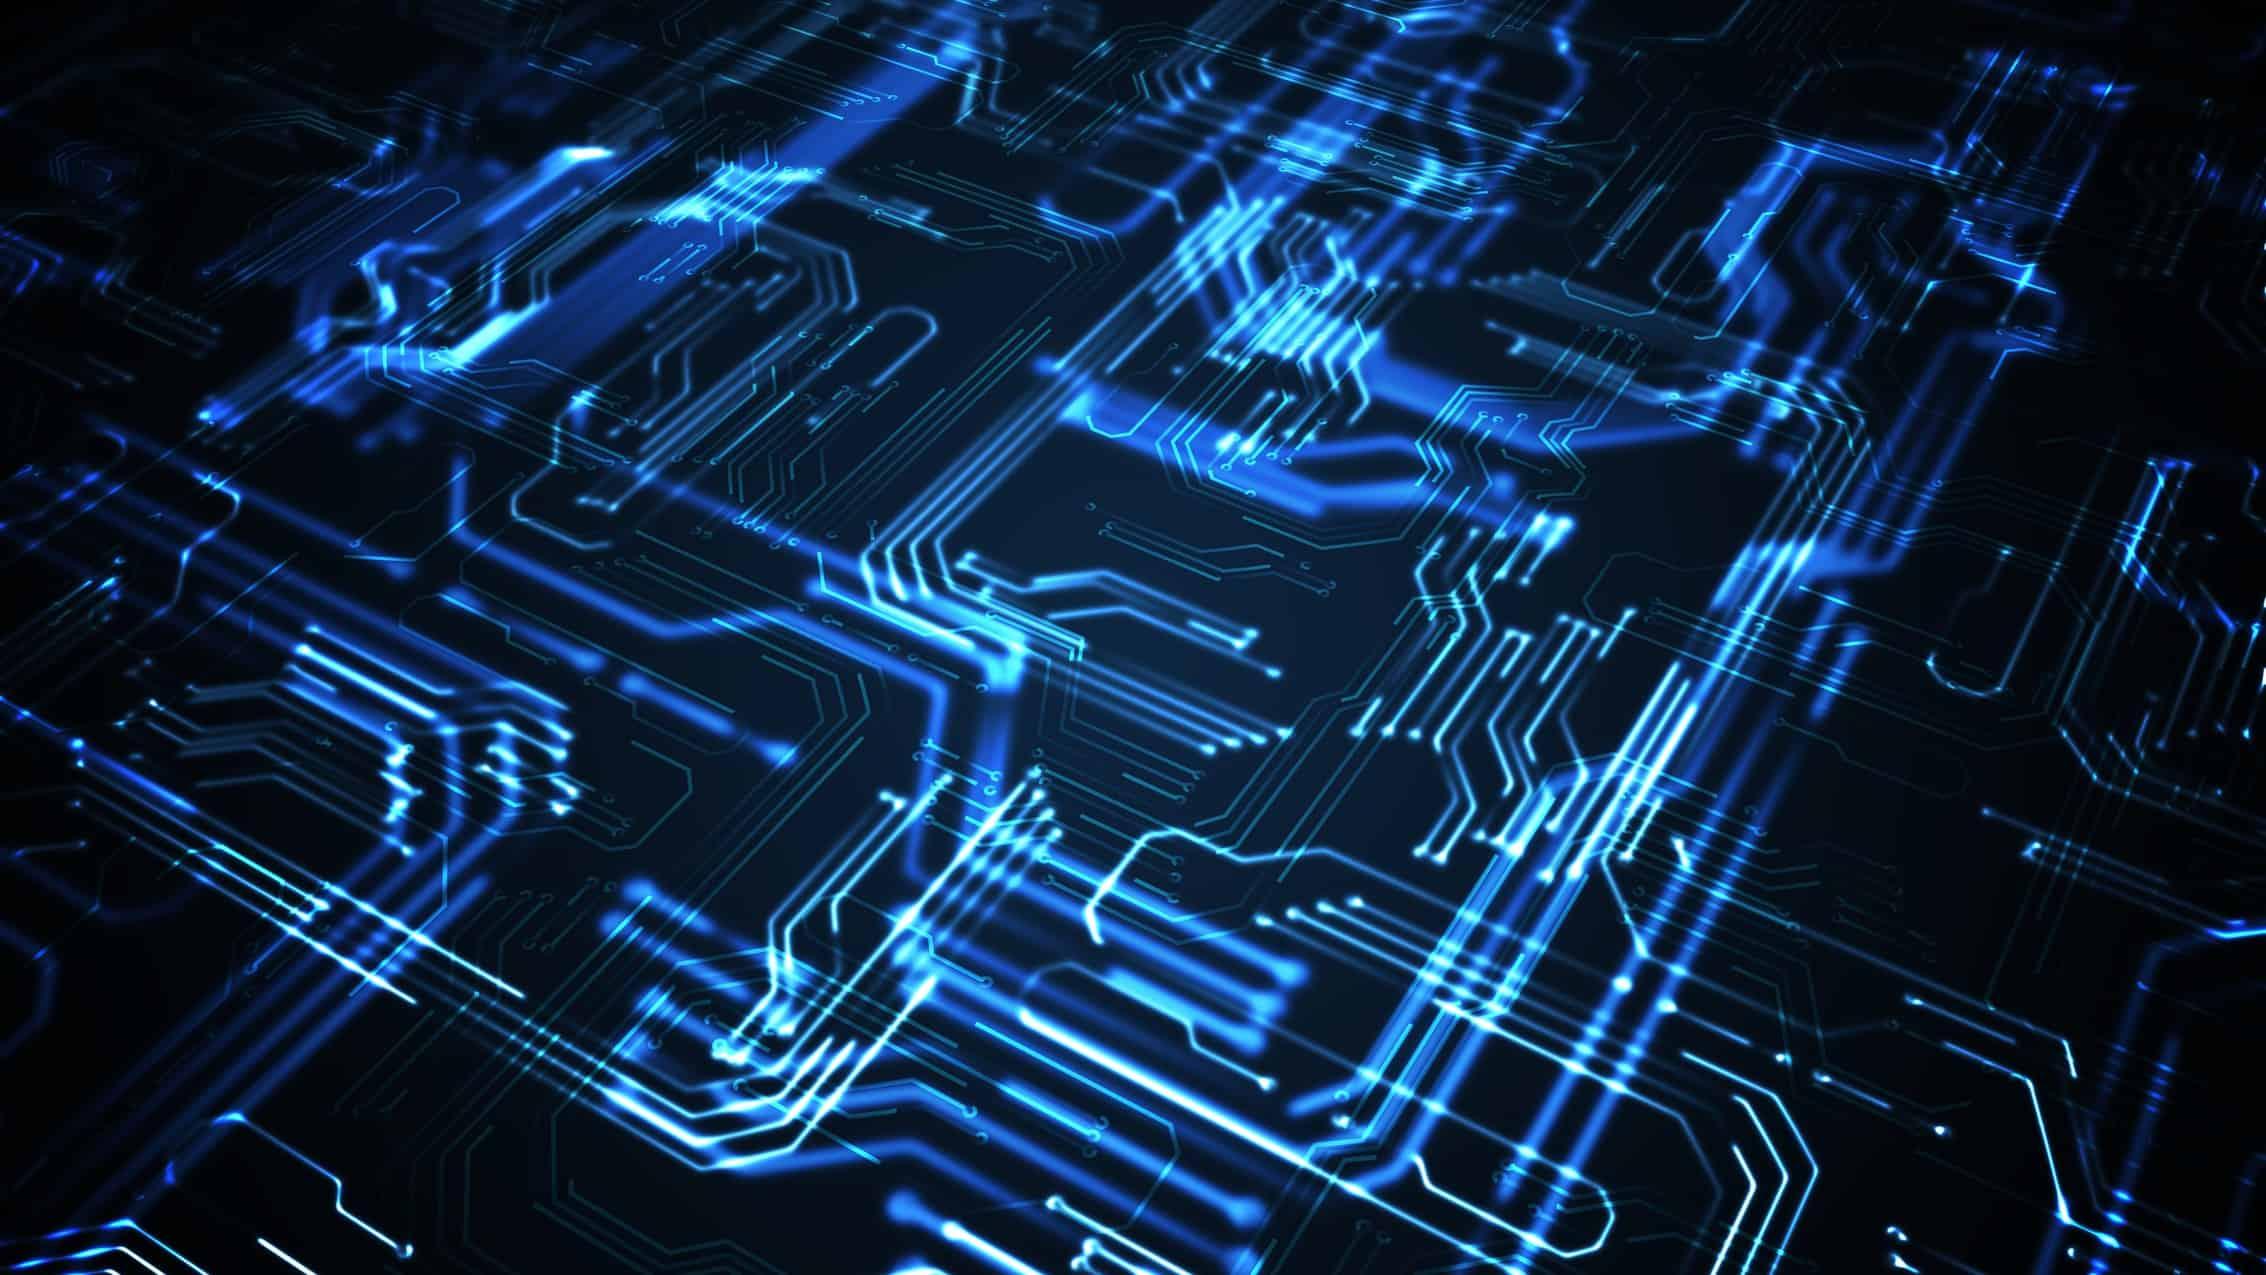 illuminated circuit board